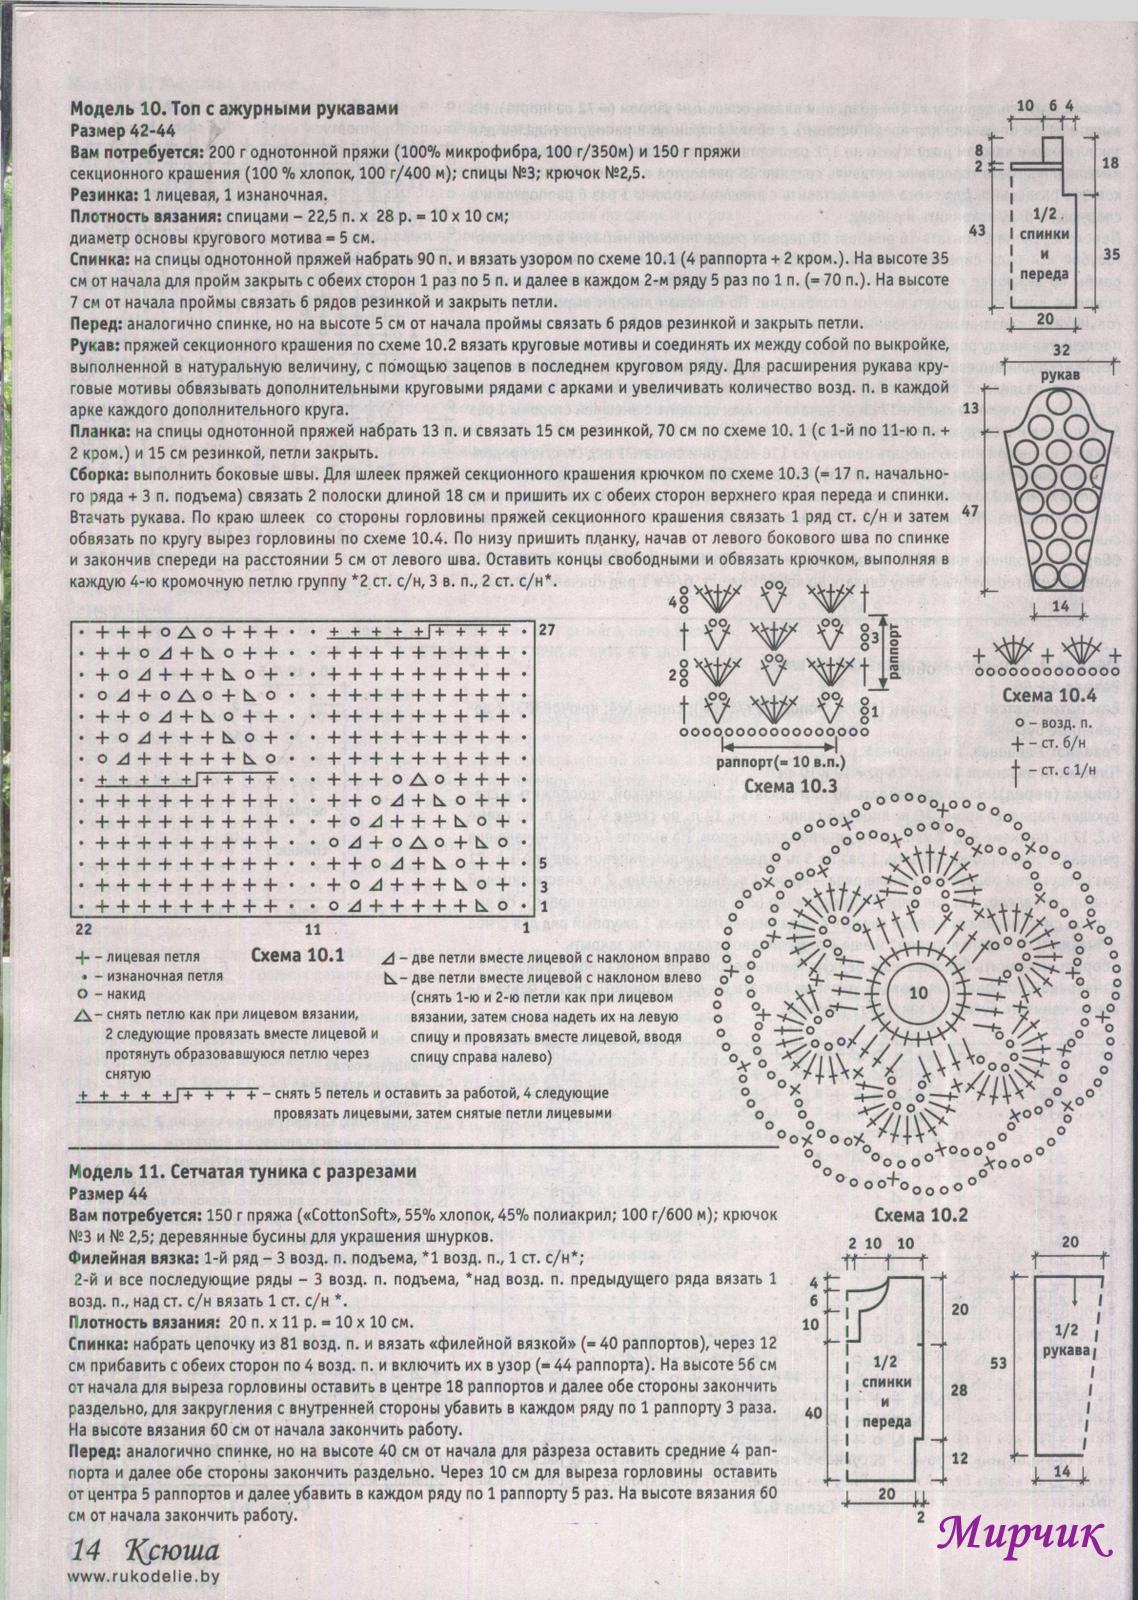 Mvz2su04